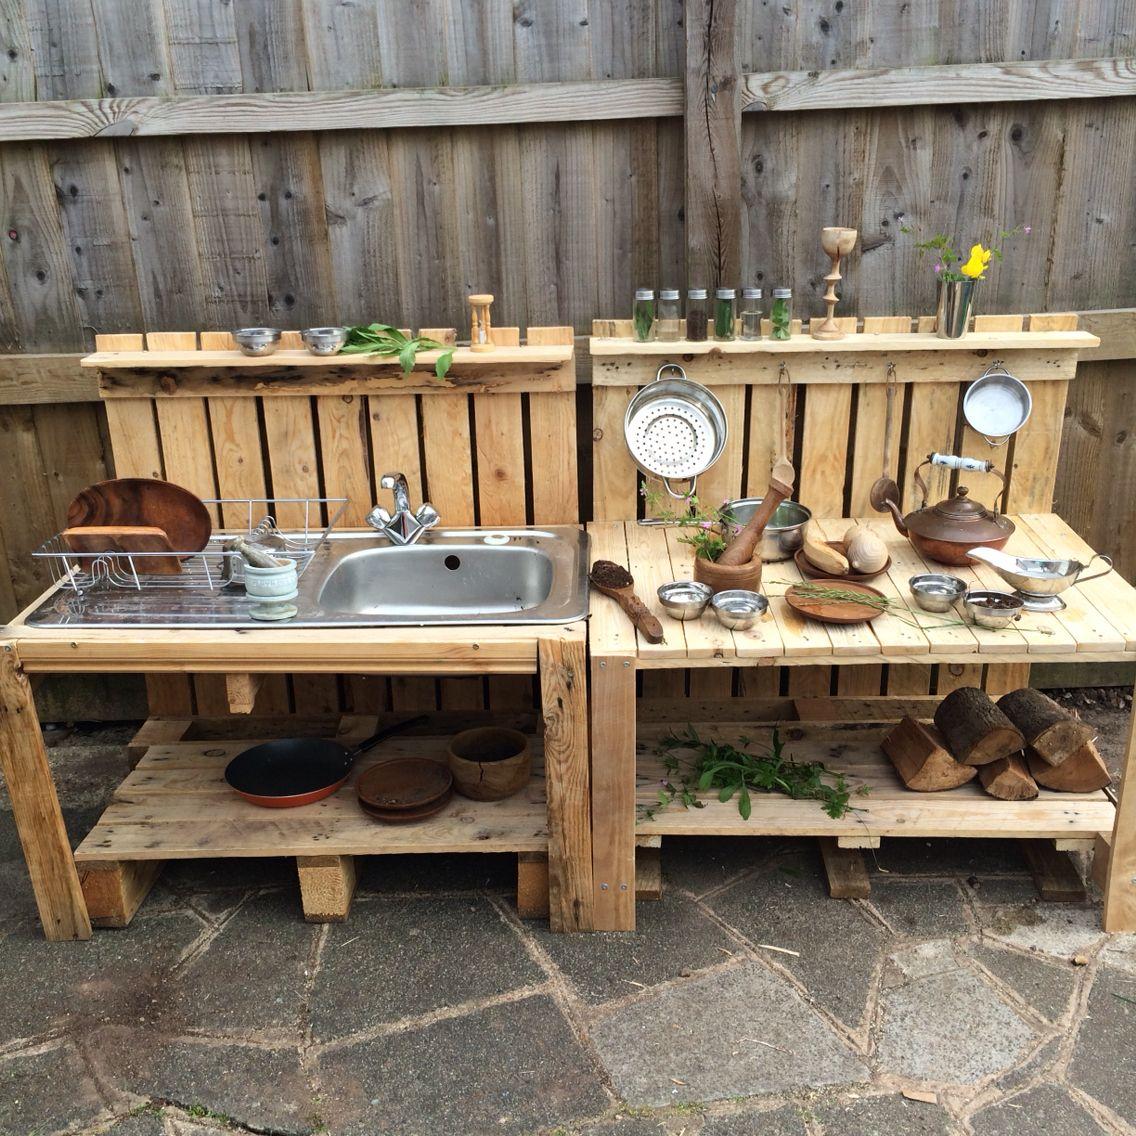 Tips For An Outdoor Kitchen: Our Mud Kitchen #mudkitchen